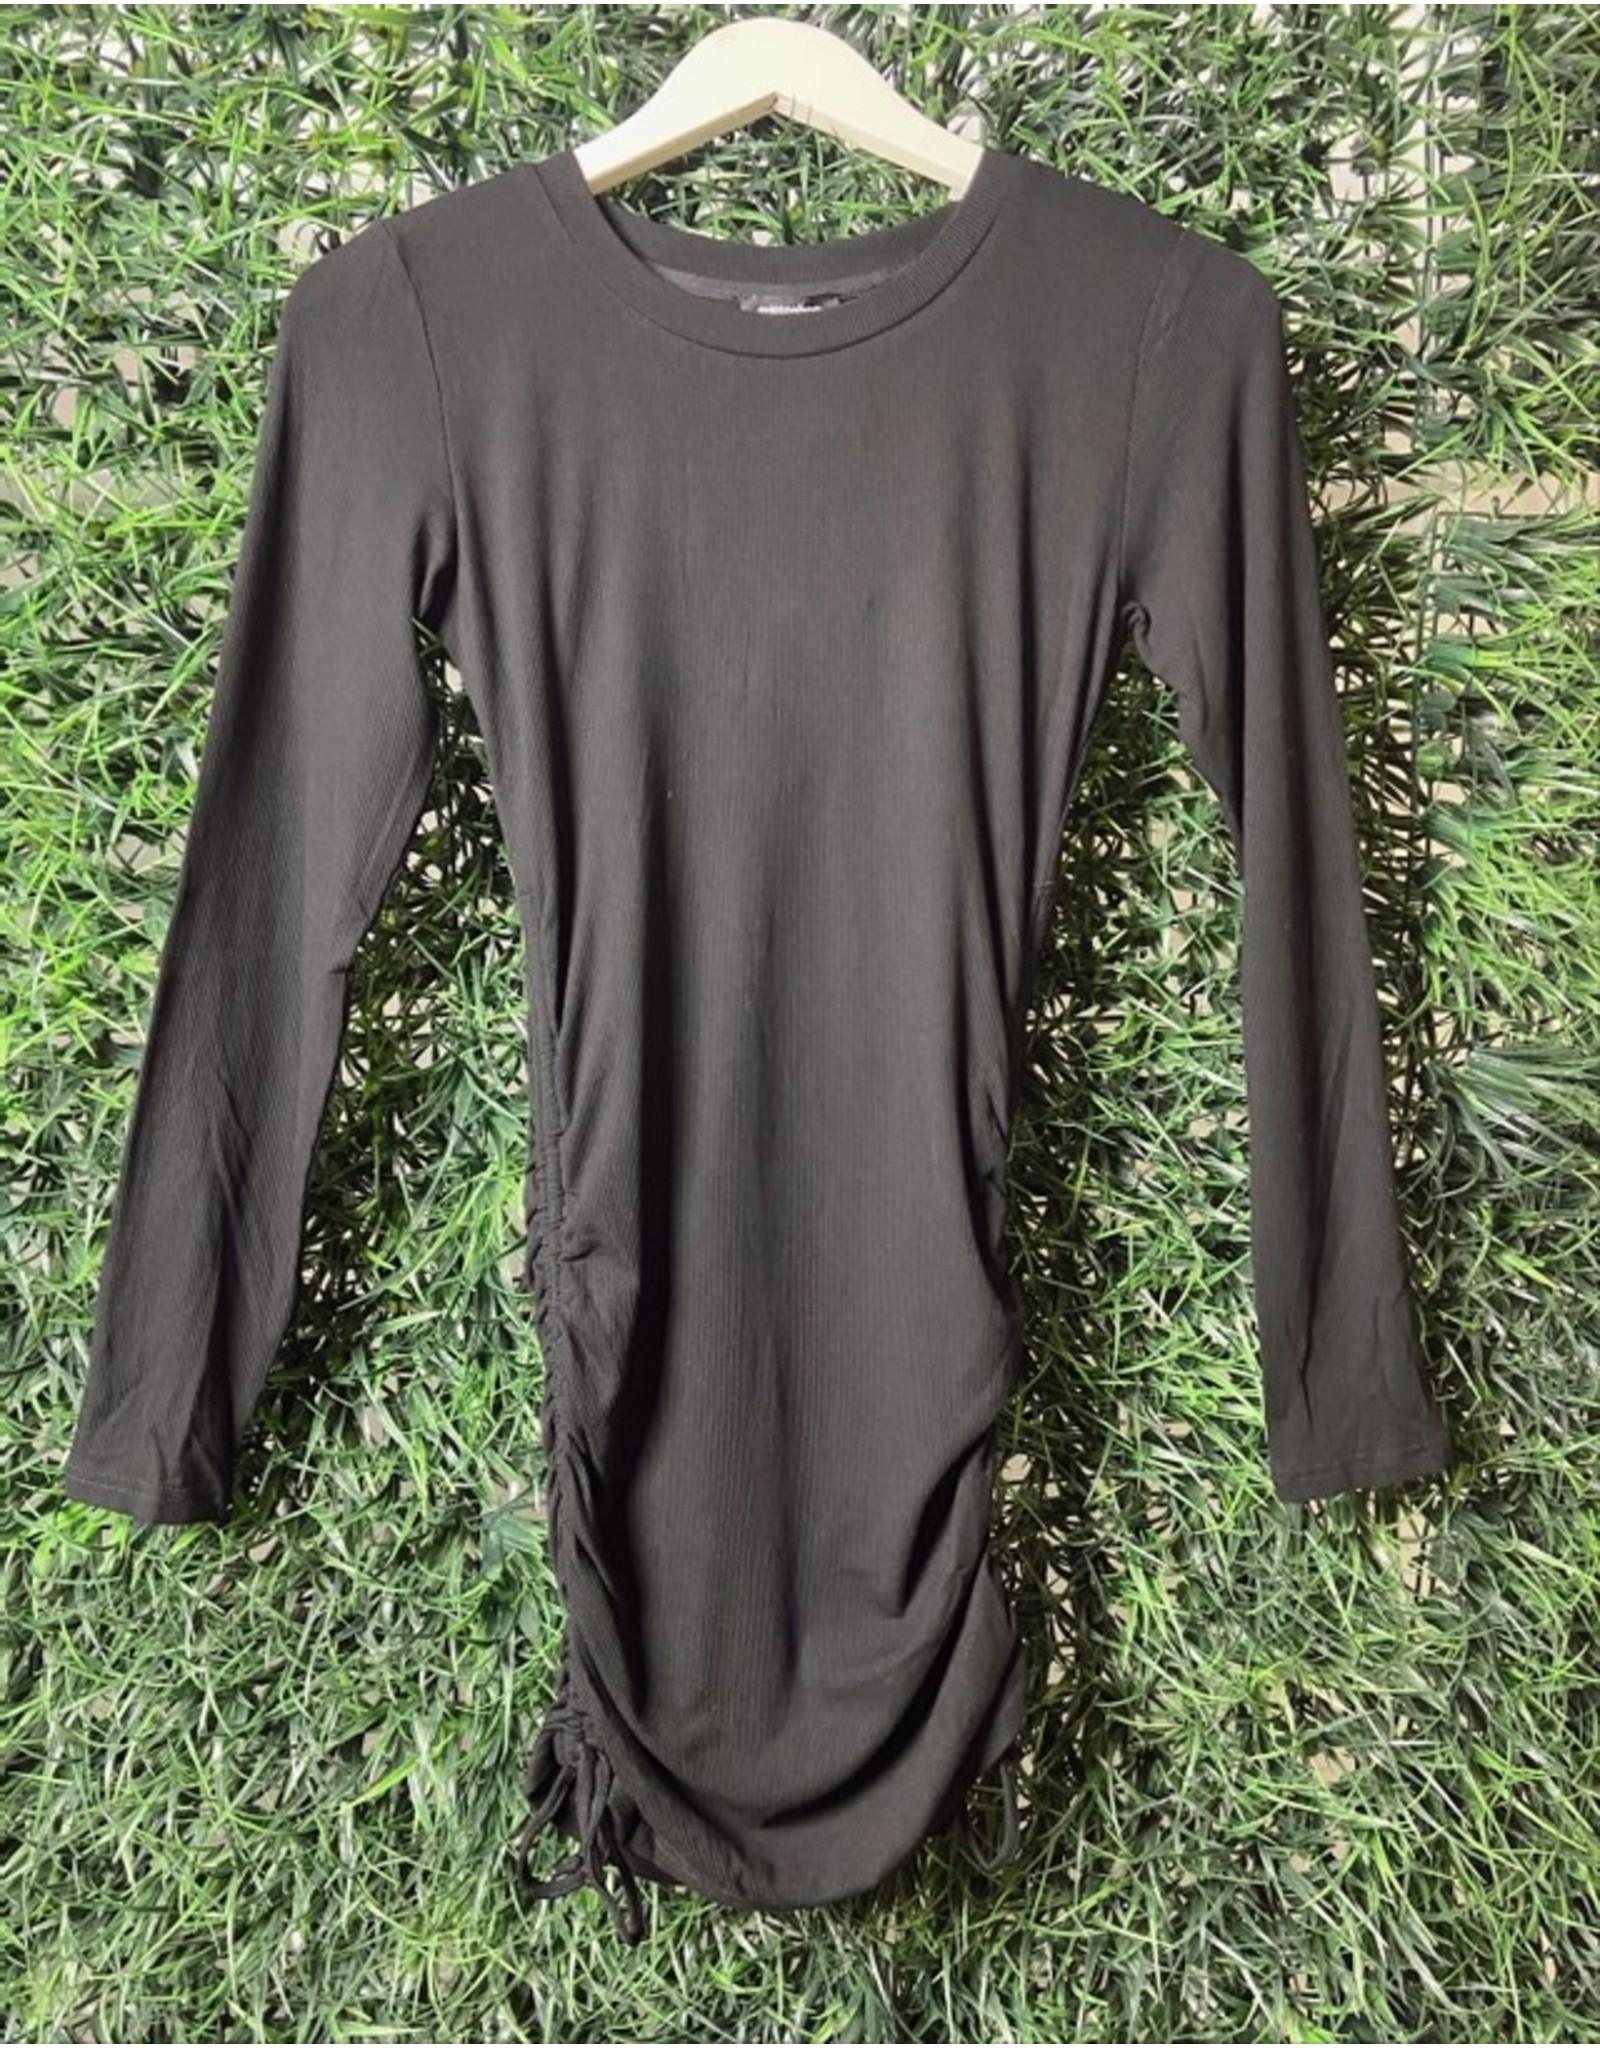 LANDON RIB RUCHED DRESS